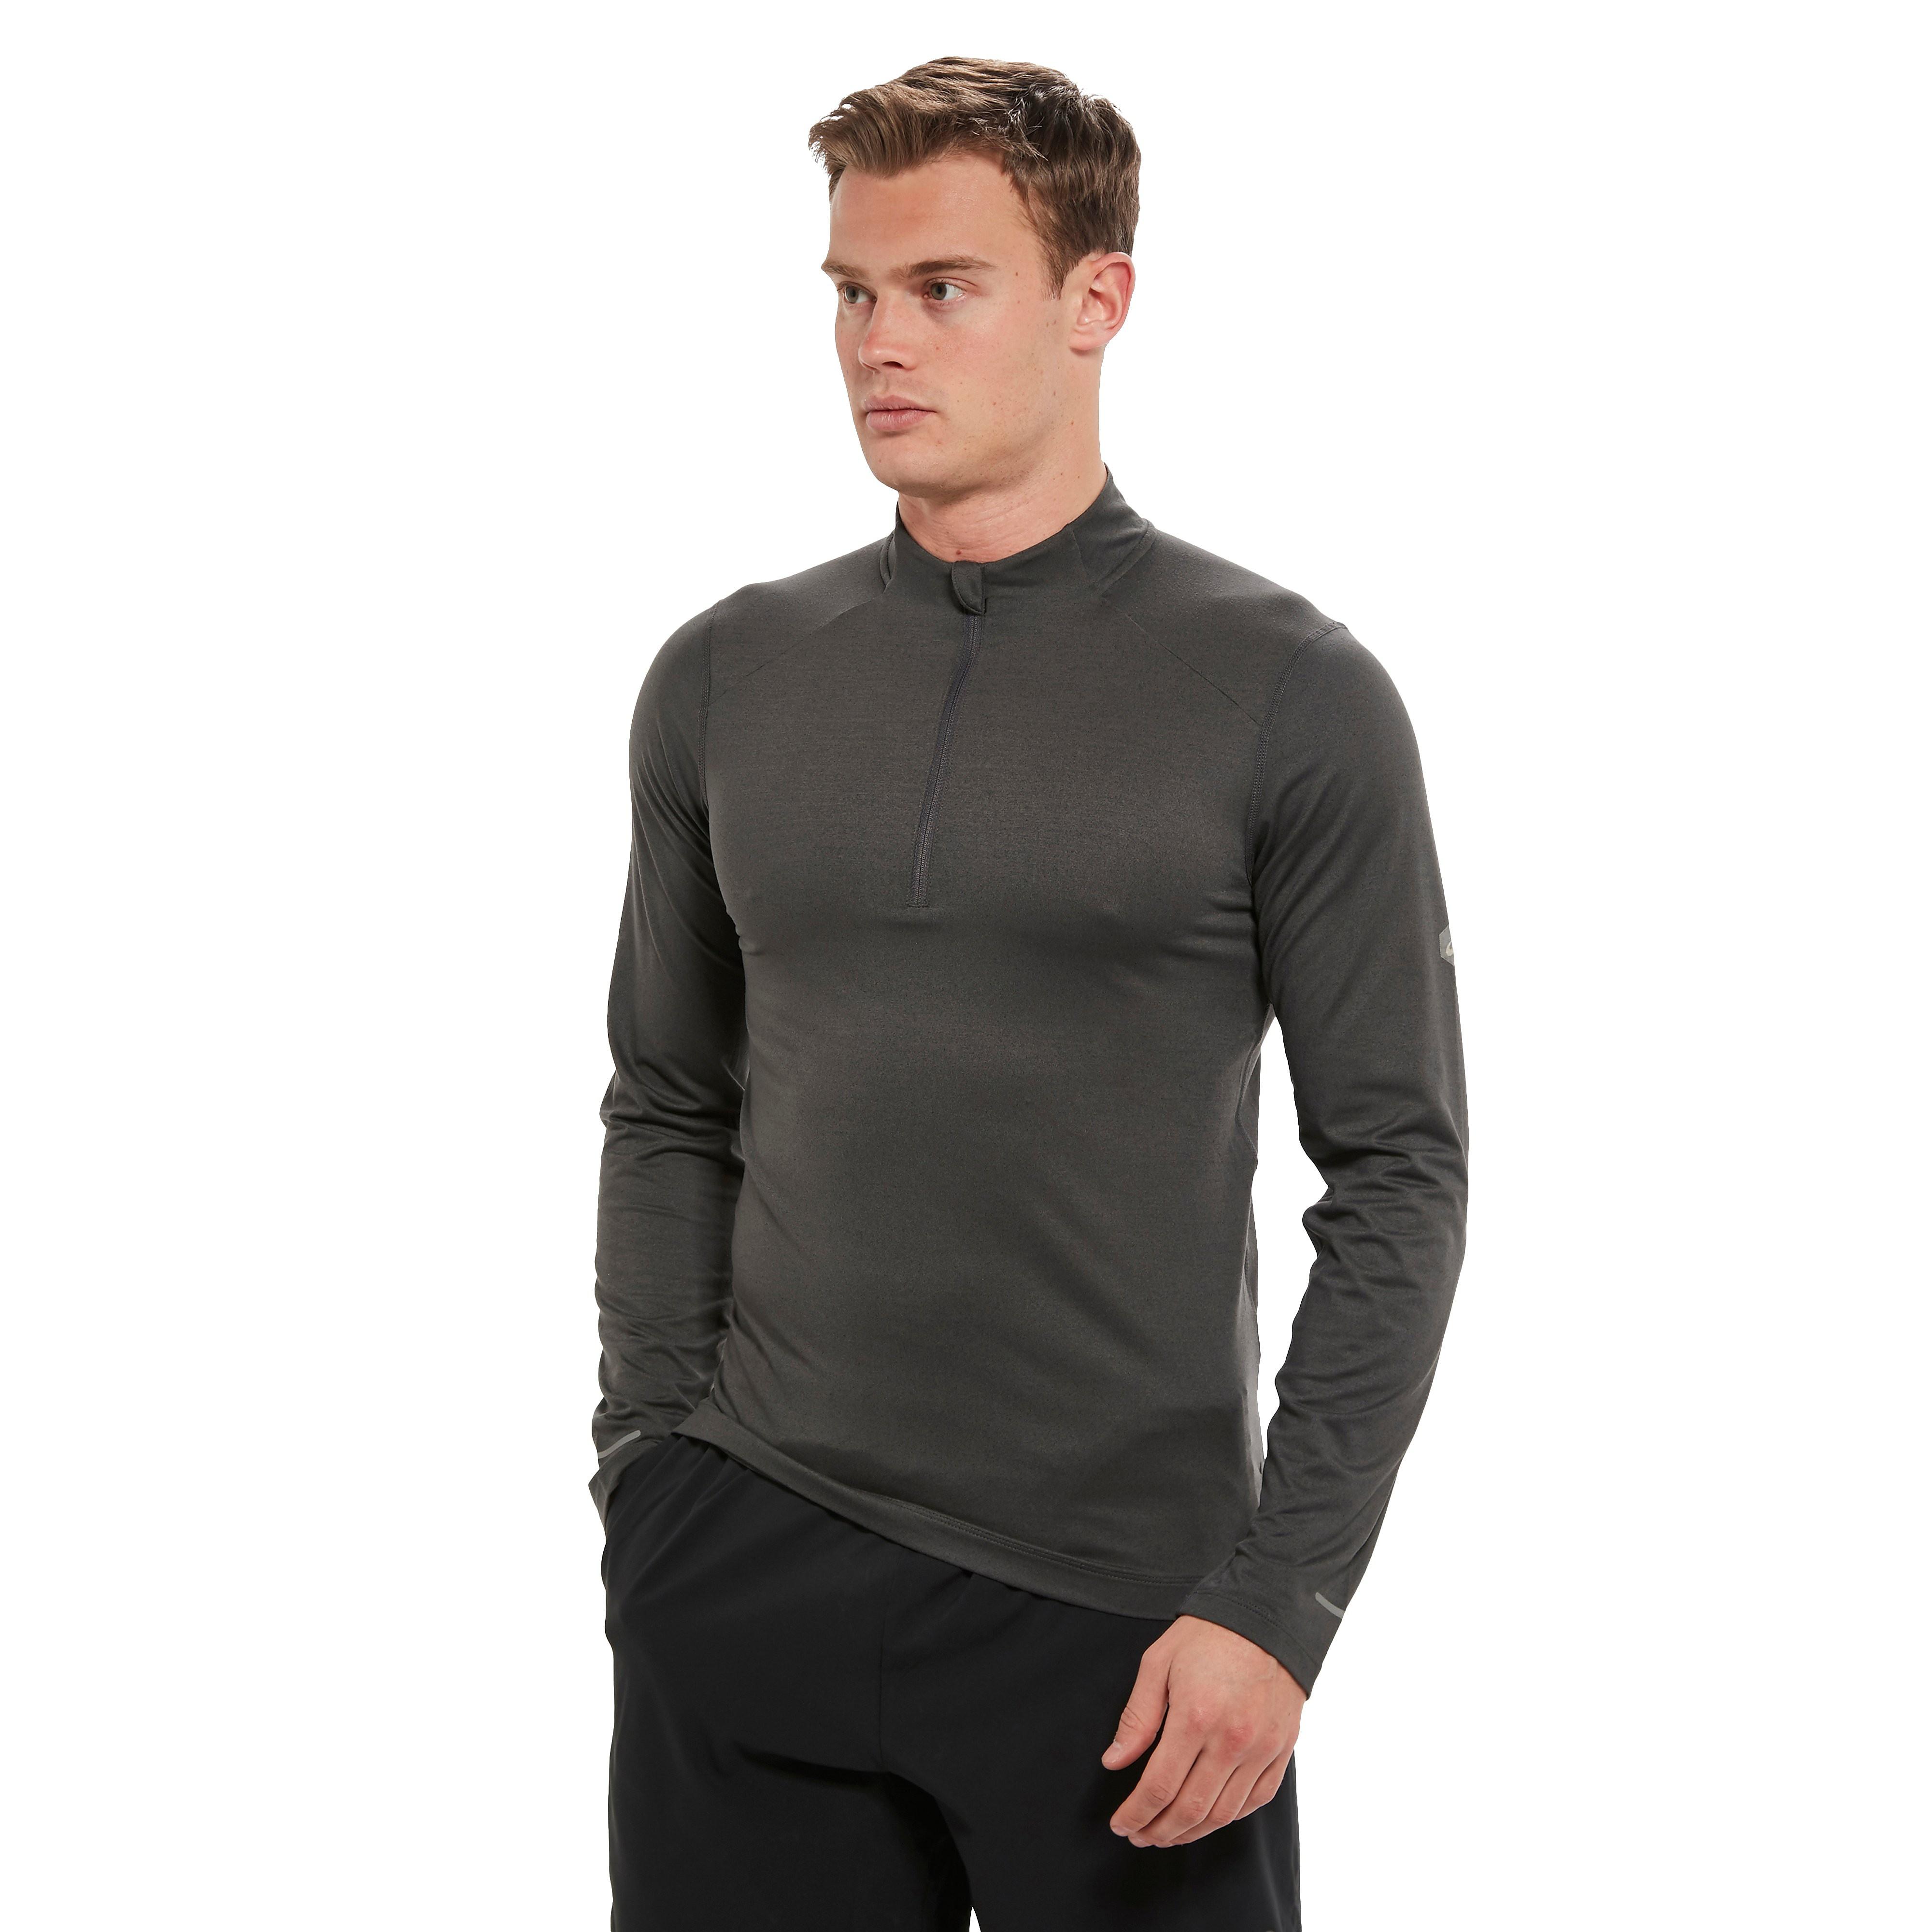 ASICS Long Sleeve 1/2 Zip Men's Jersey